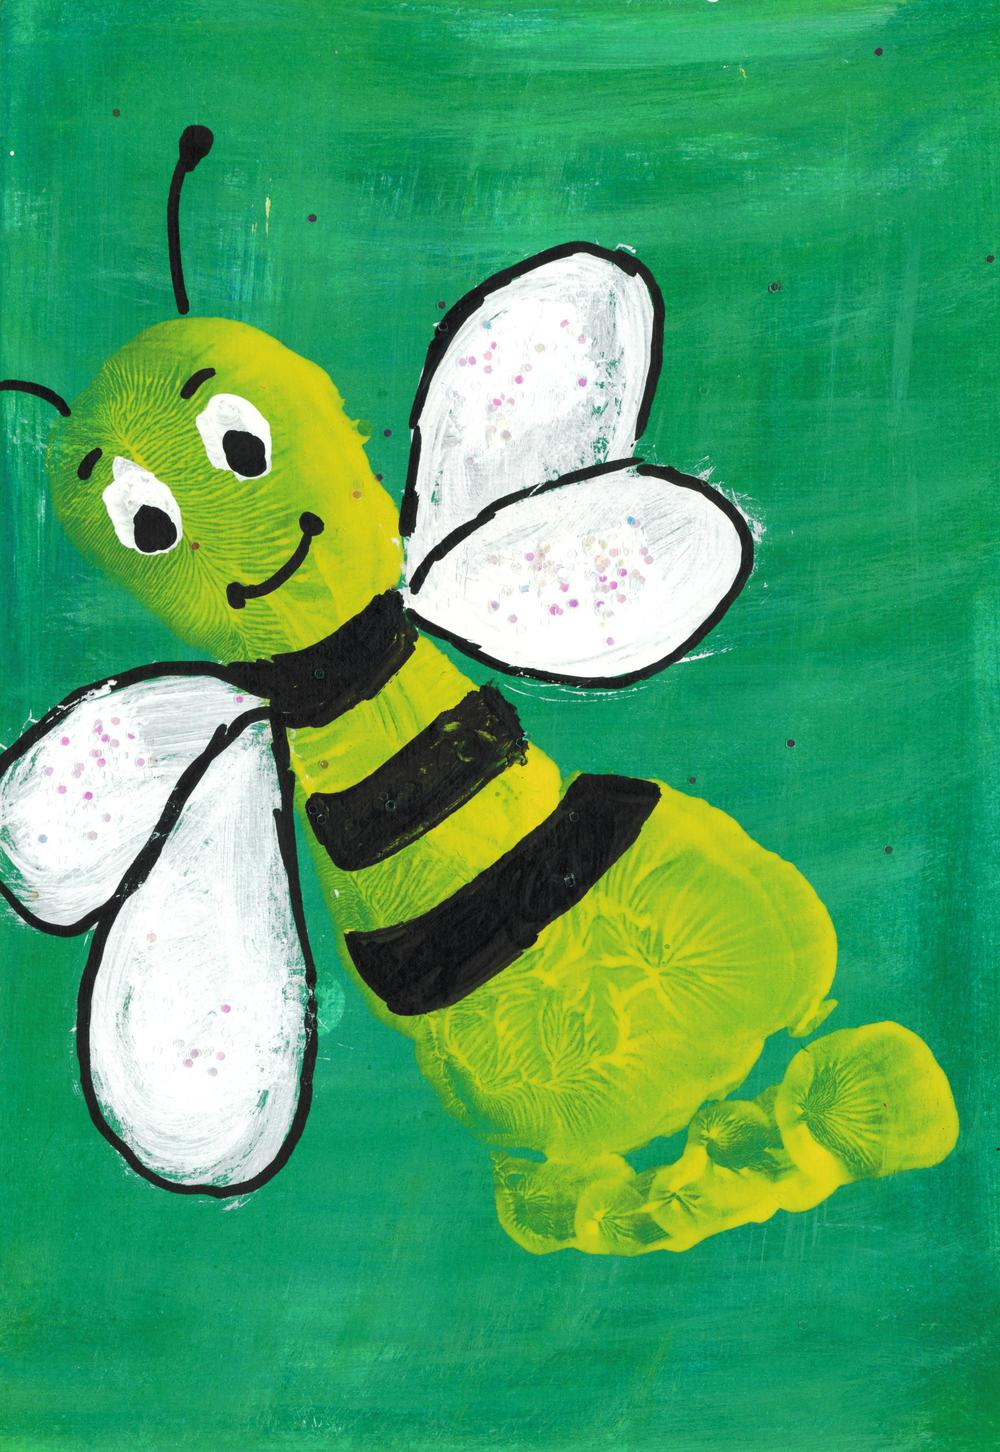 BeeHappy_TI092813.jpg